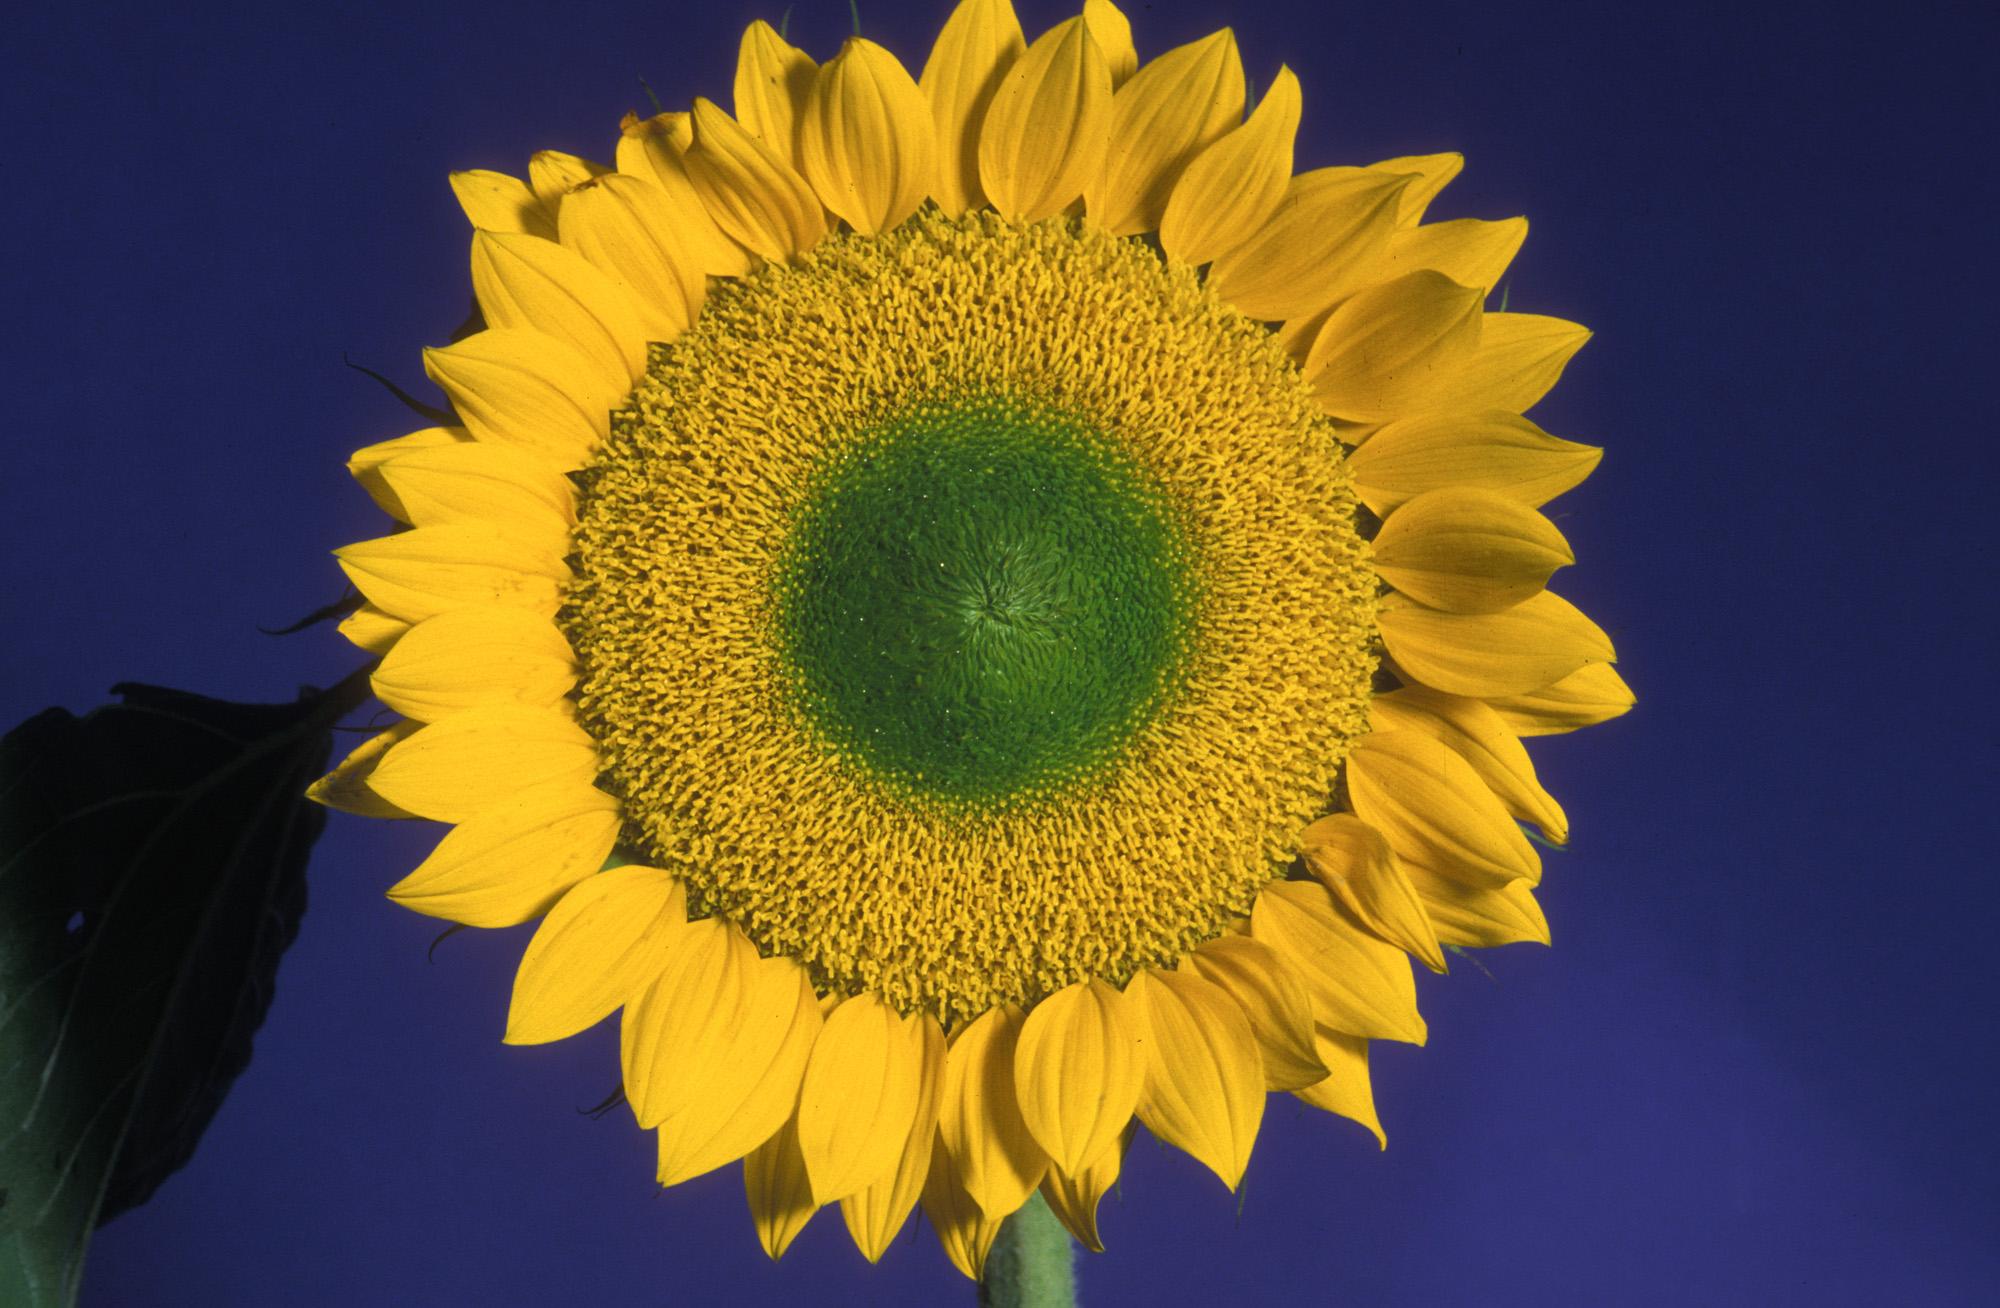 Blüte, Blüten, Pflanze, Pflanzen, Natur, Wachstum, Leben, Stempel, Blätter, Makrobereich, Makro, analog, Großformat, analoge Fotografie, Sonnenblume, Sonne, gelb, blau